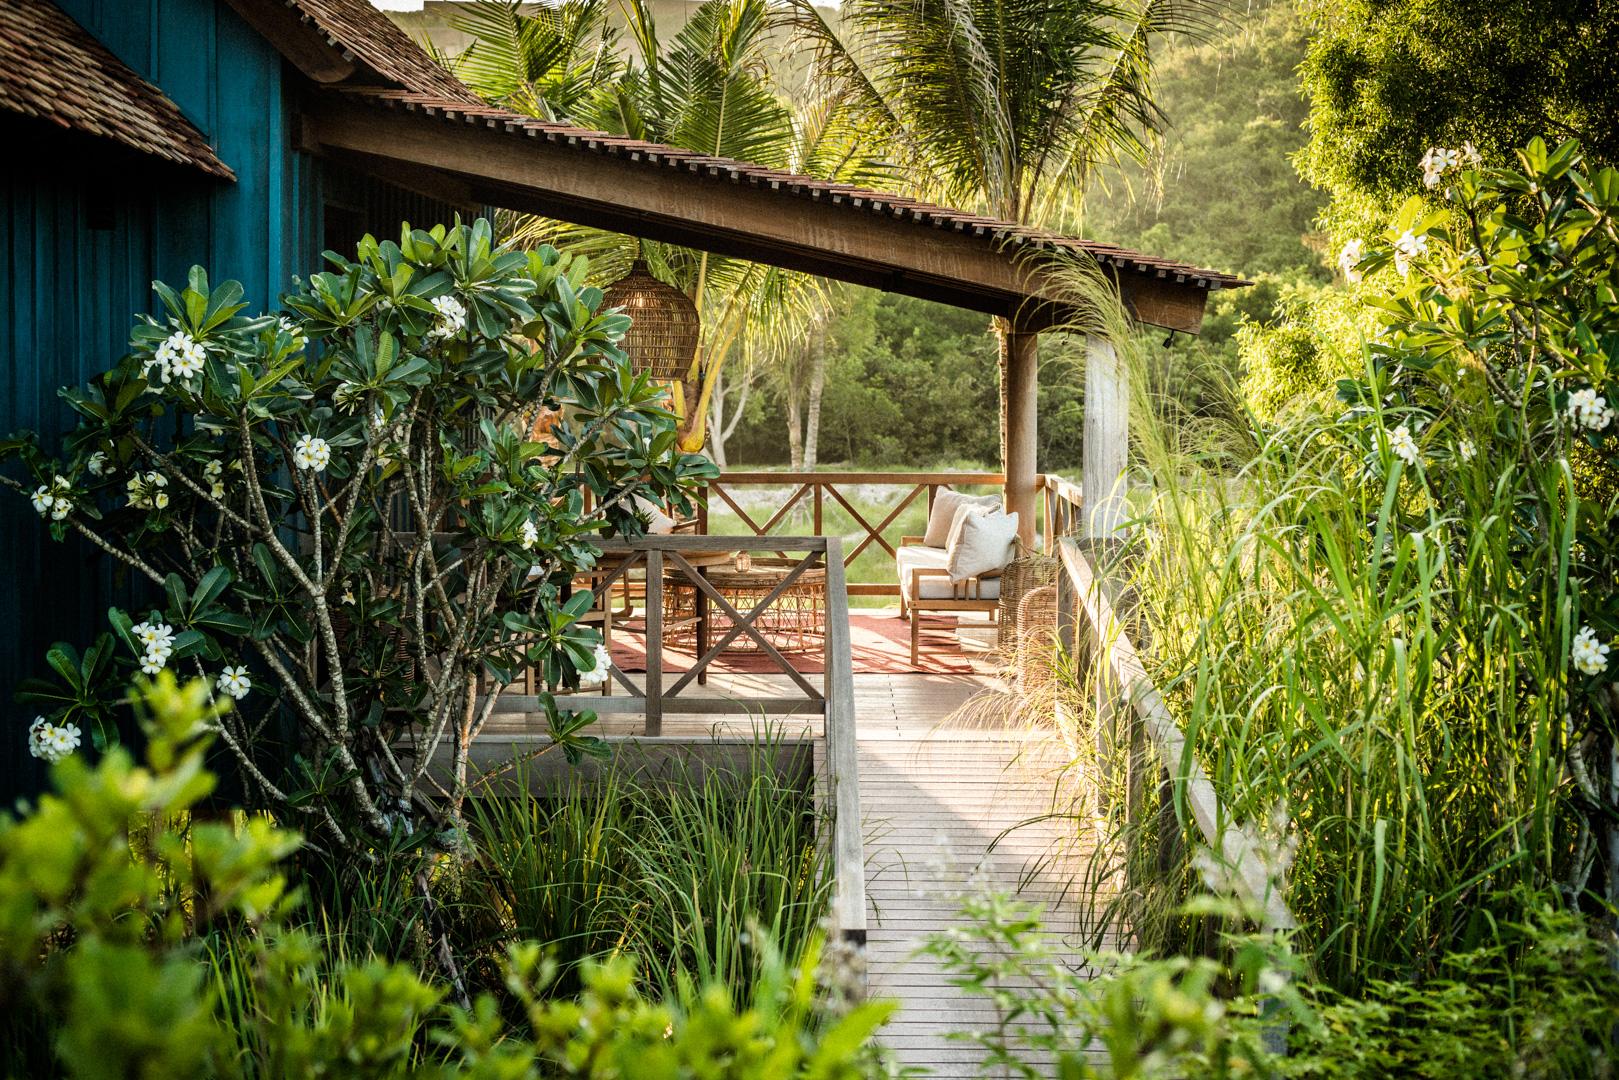 Zannier-Hotels-Bãi-San-Hô-Paddy-Field-Villa-Exterior-1-©-Frederik-Wissink-for-Zannier-Hotels-1